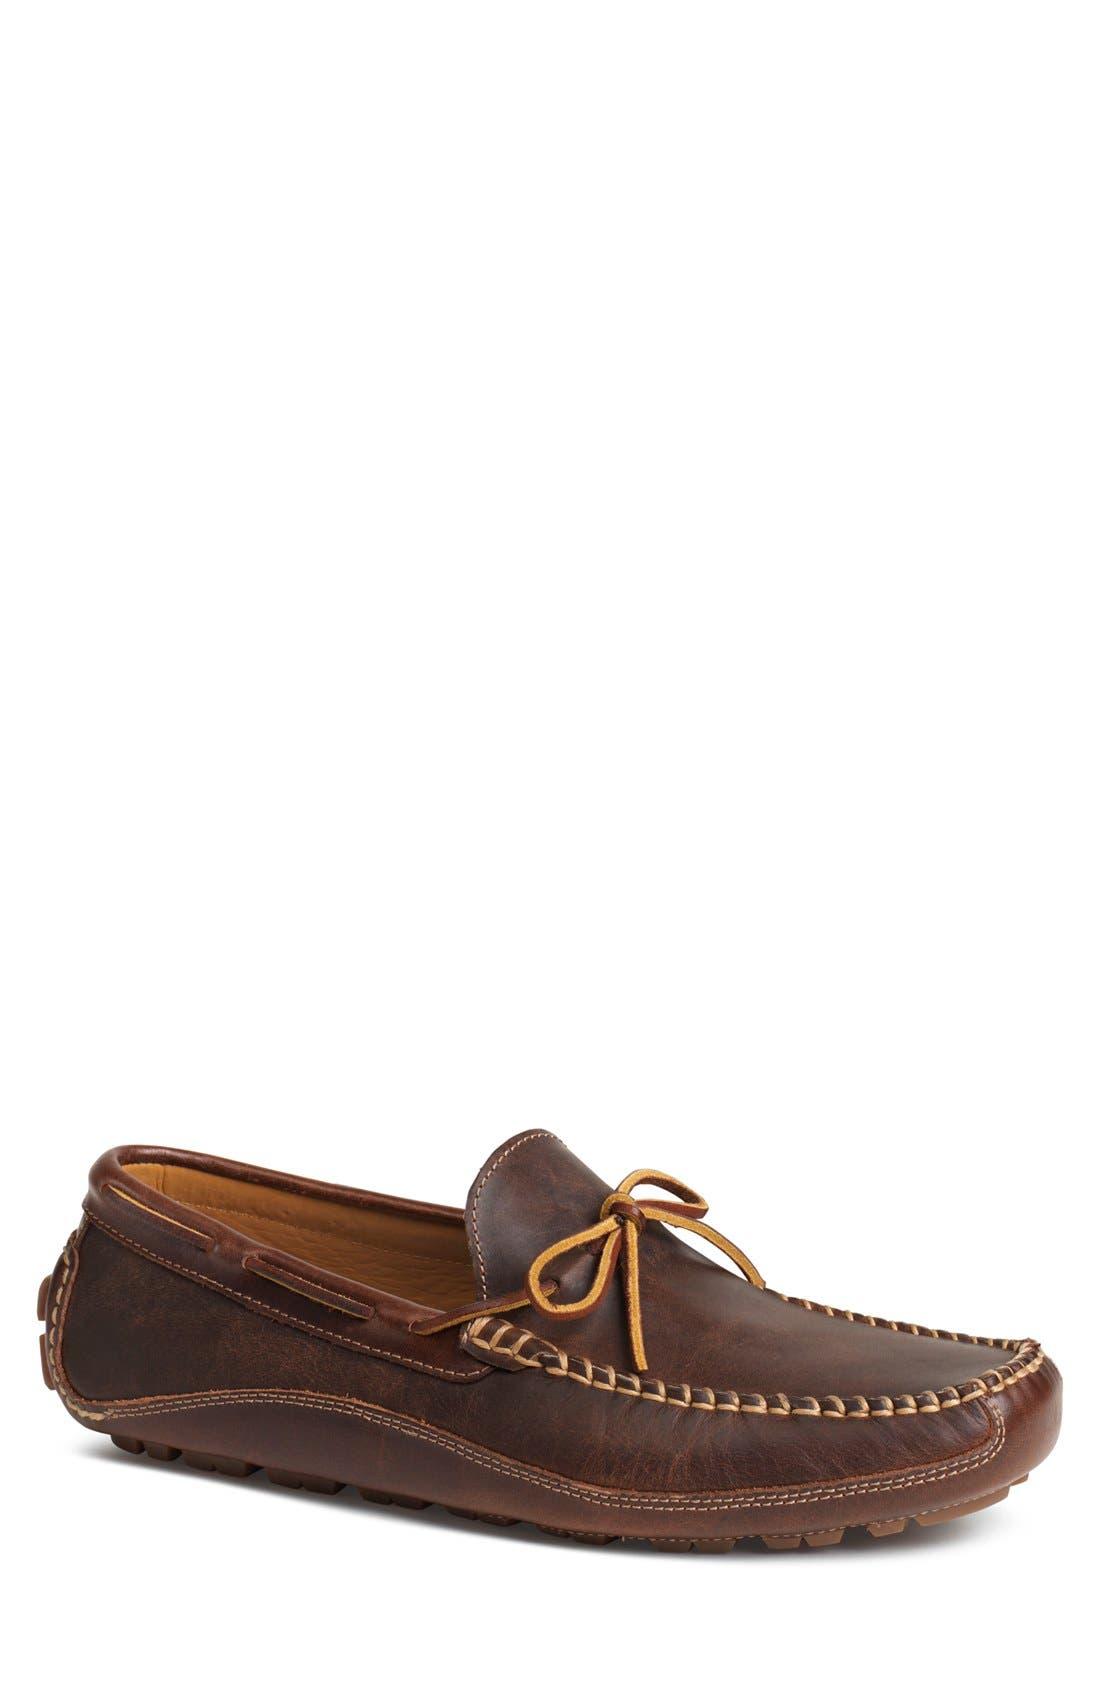 'Drake' Leather Driving Shoe,                             Main thumbnail 4, color,